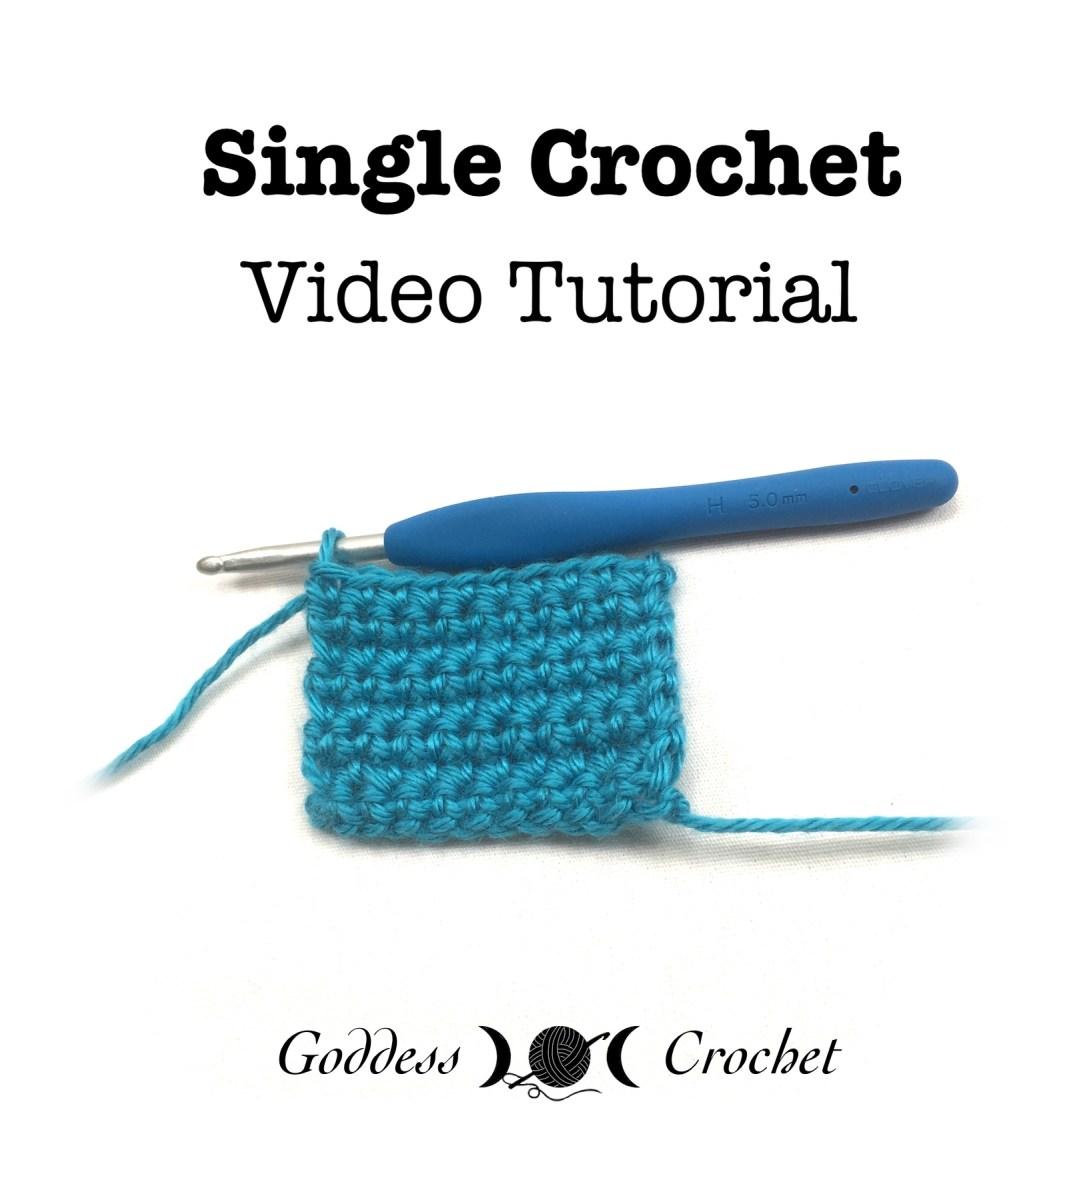 Single Crochet Video Tutorial Beginner Crochet Series Goddess